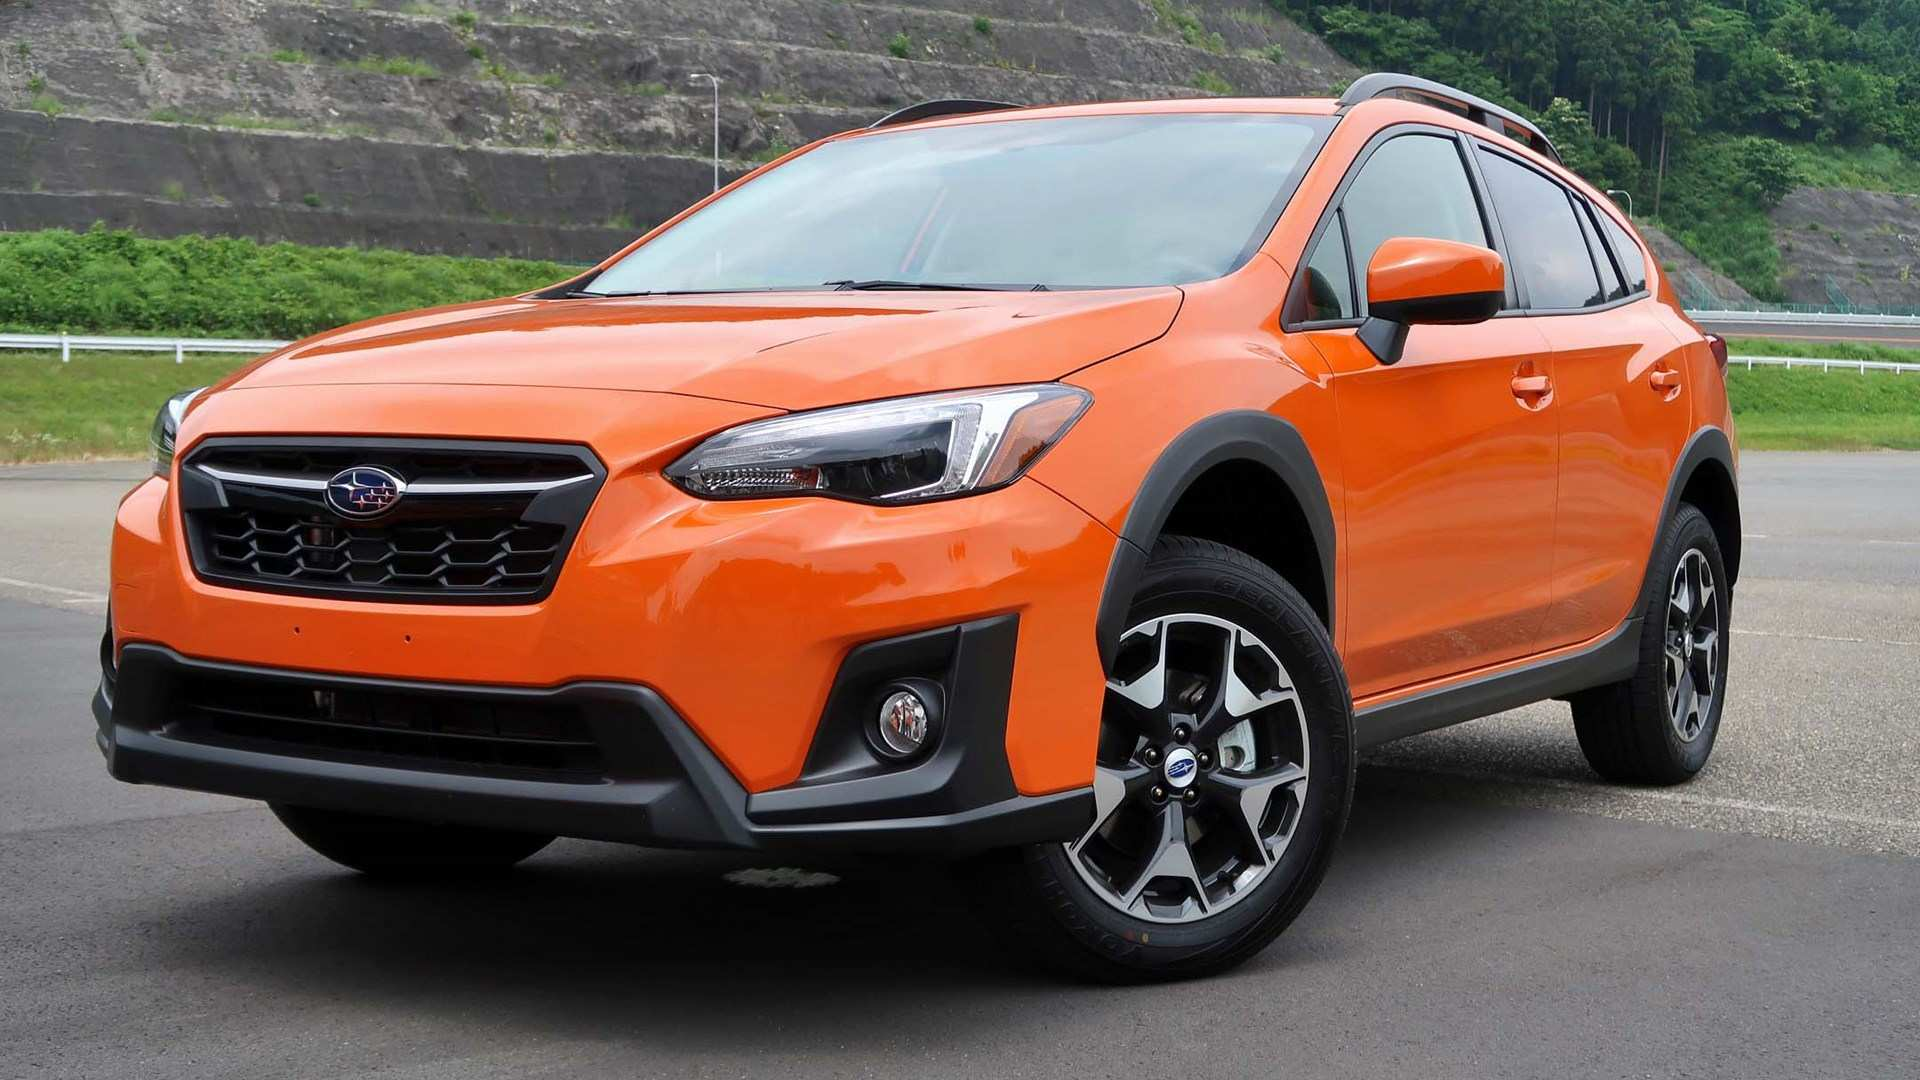 28 New Subaru Crosstrek 2020 Canada Overview for Subaru Crosstrek 2020 Canada